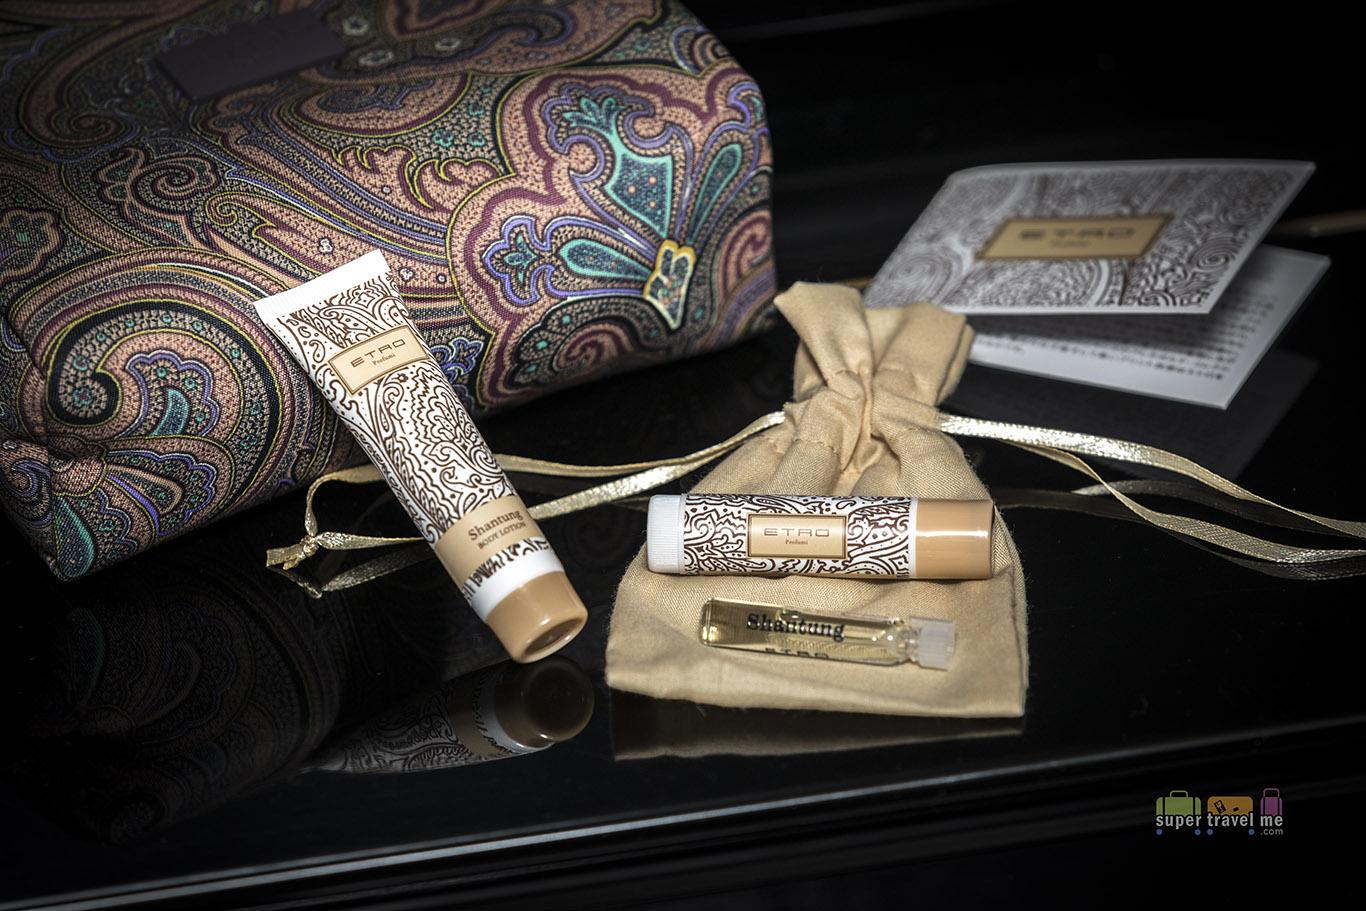 ETRO moisturiser, lip balm and Eau de Parfum